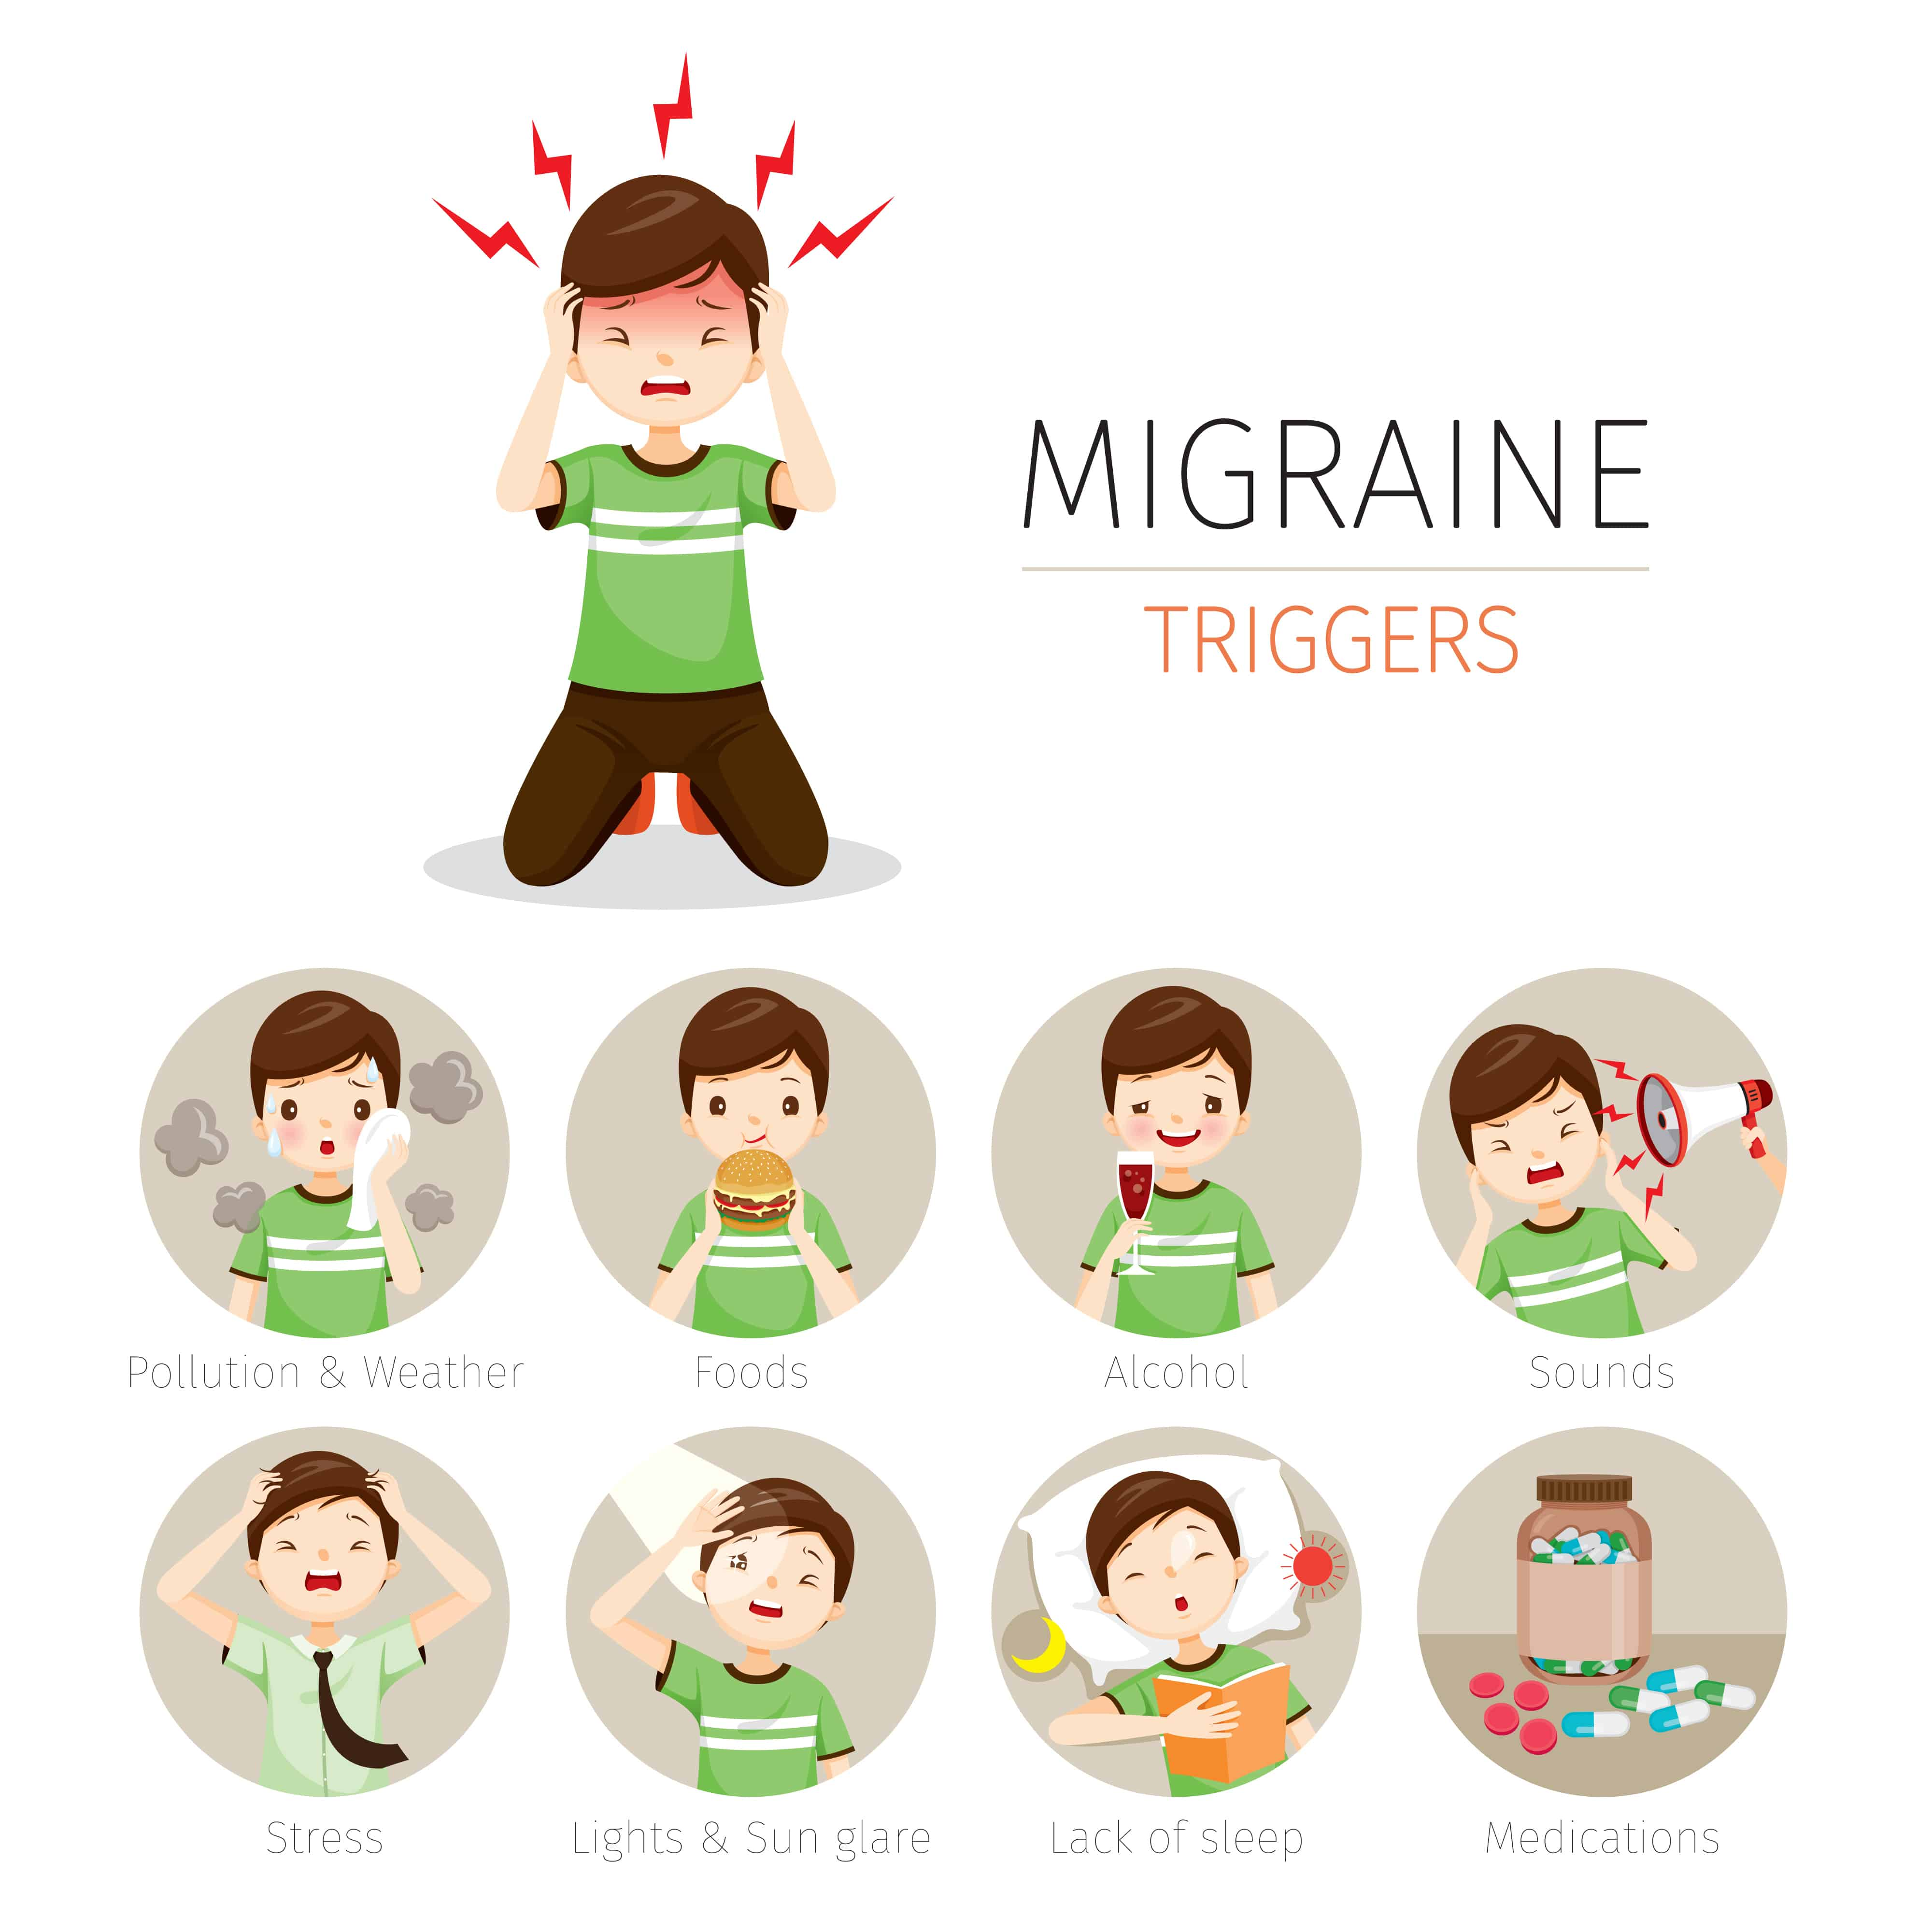 Eye Pain And Headache, harold p. freeman, migraine